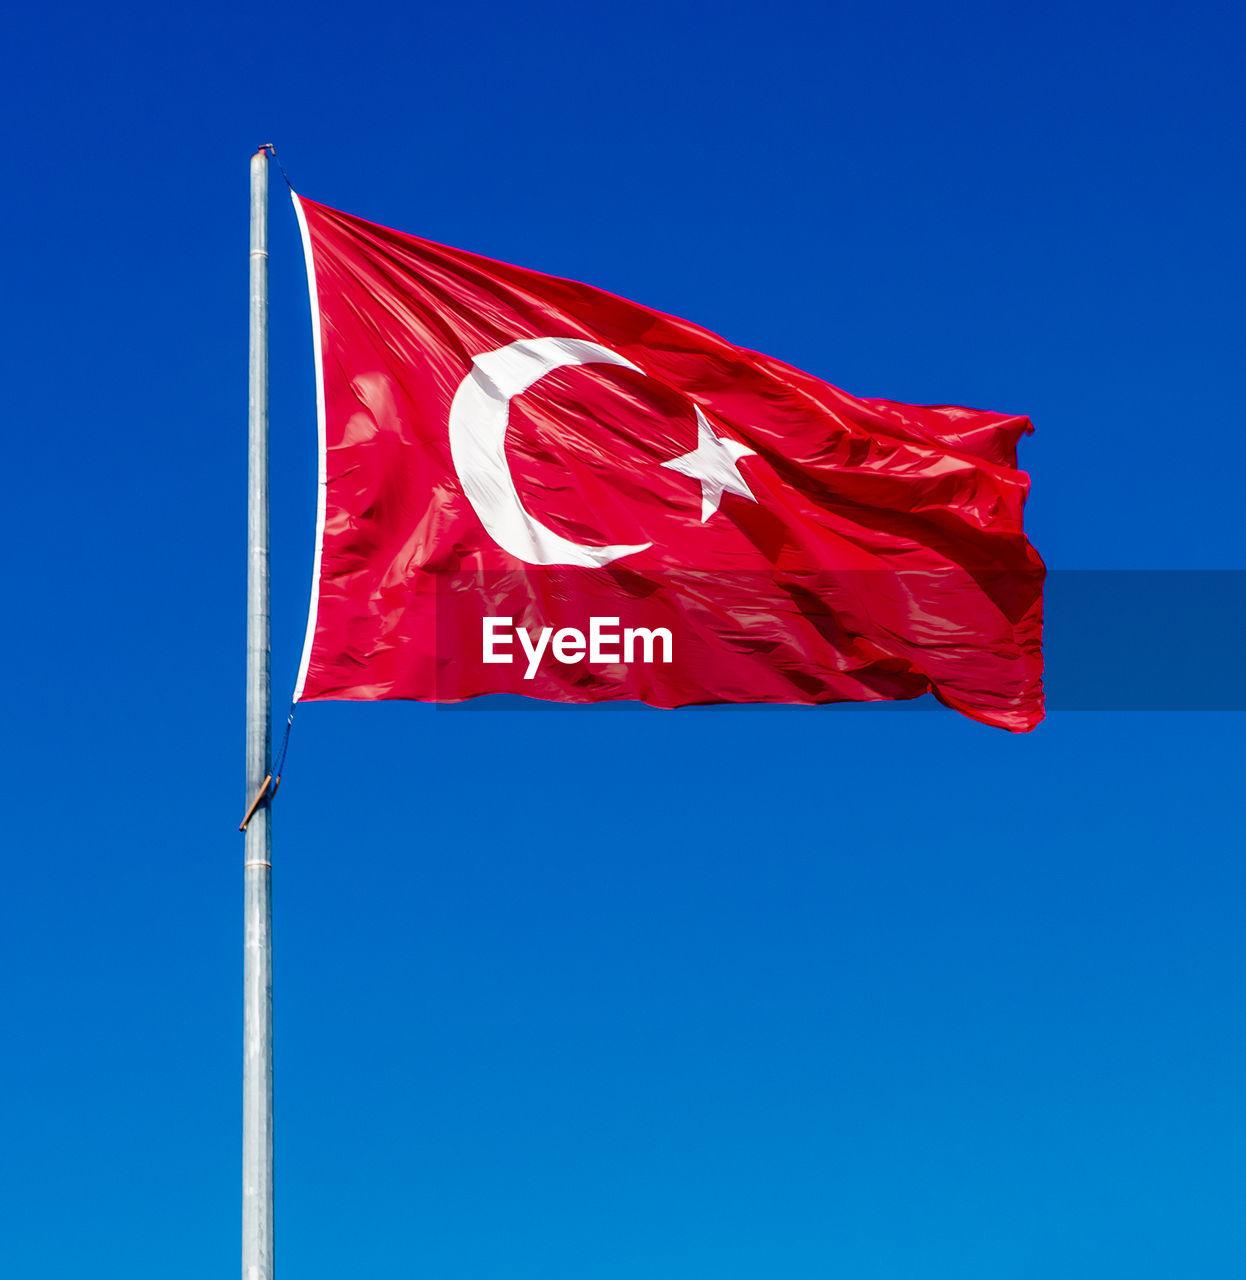 Photo taken in Ankara, Turkey